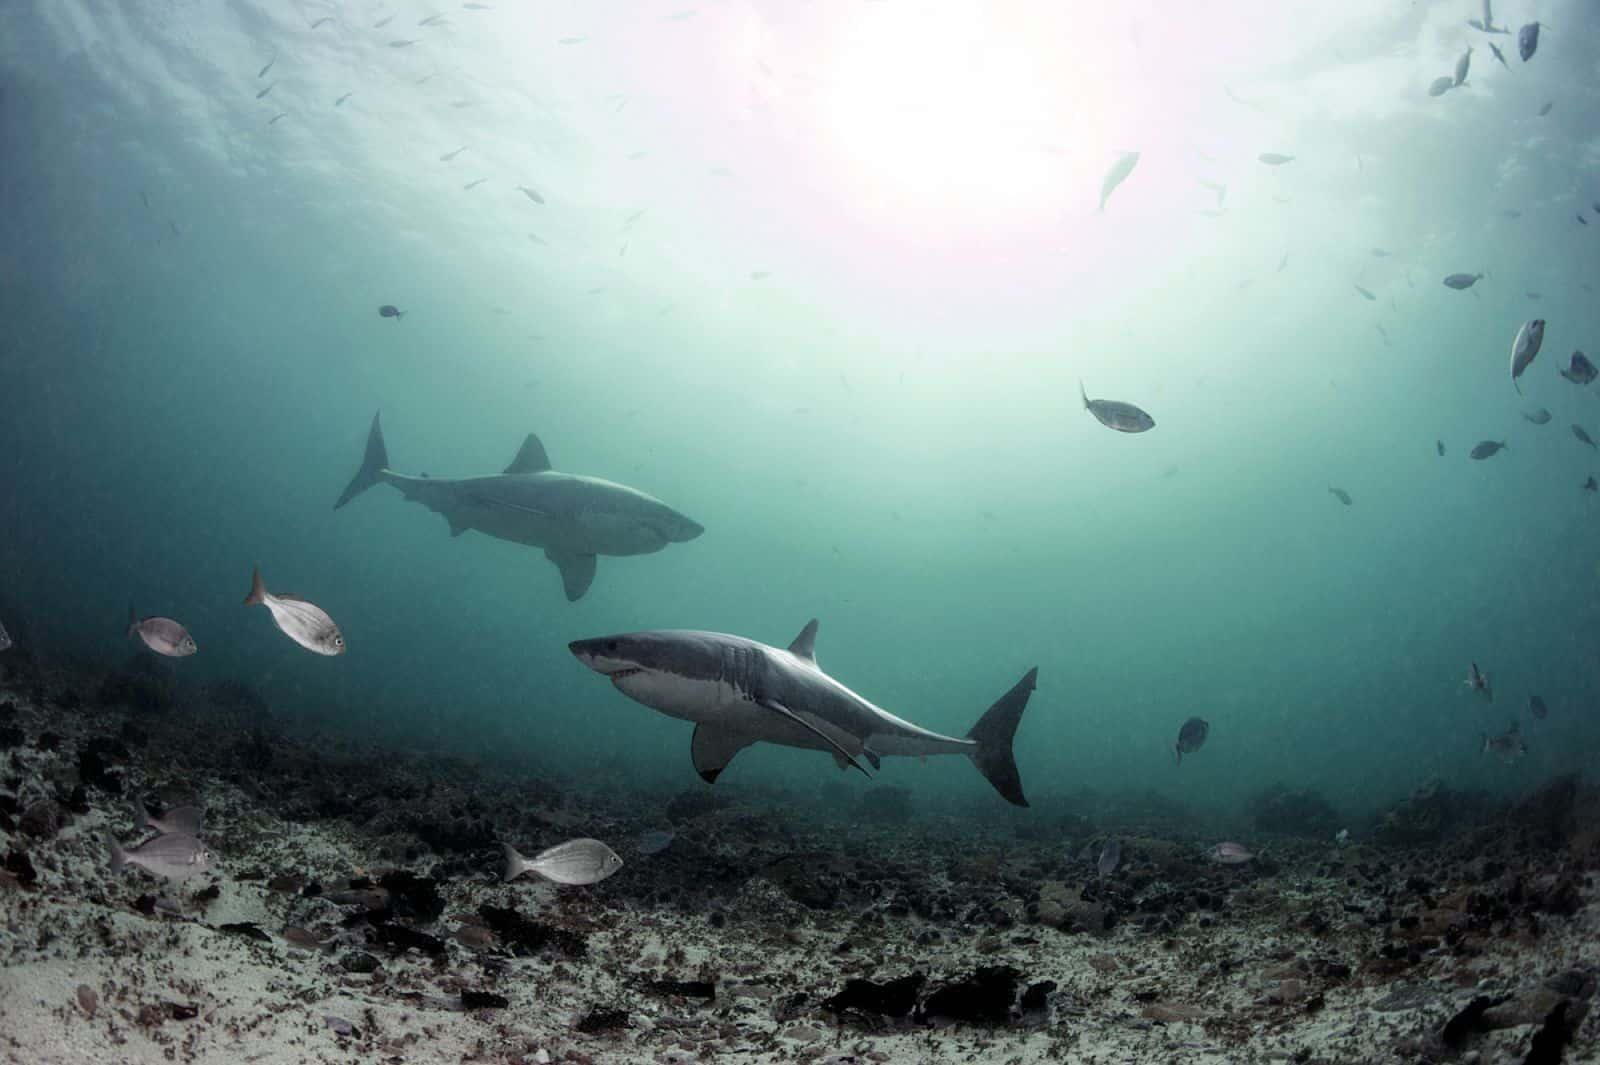 Photo credit - Daniel Botelho - white sharks (DLB_2855)